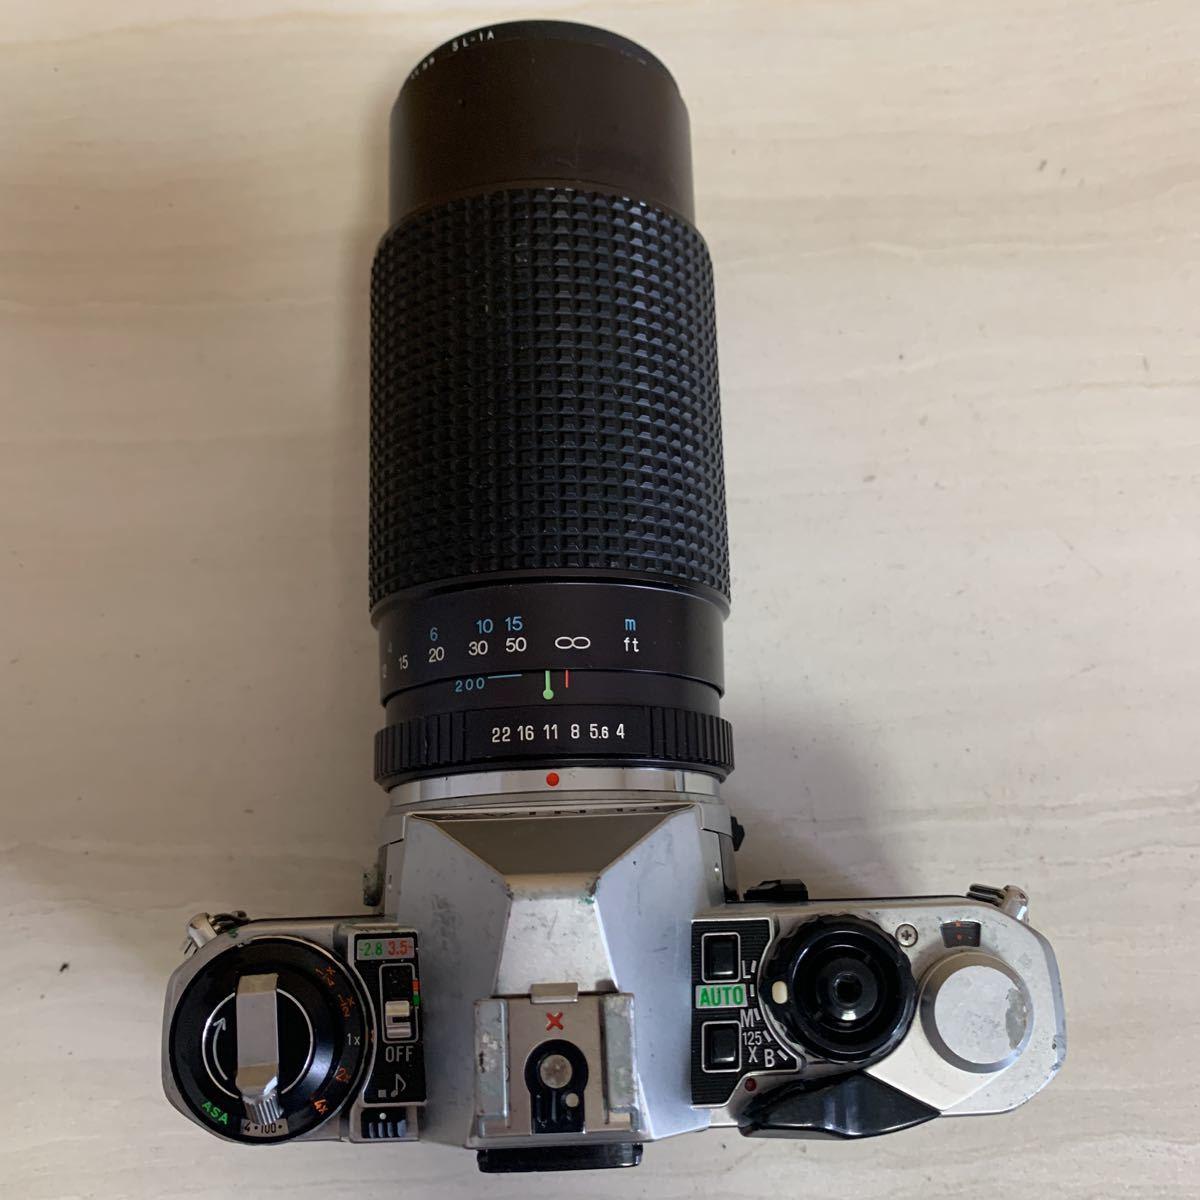 PENTAX ME F ペンタックス 一眼レフカメラ フィルムカメラ 未確認 2025_画像4